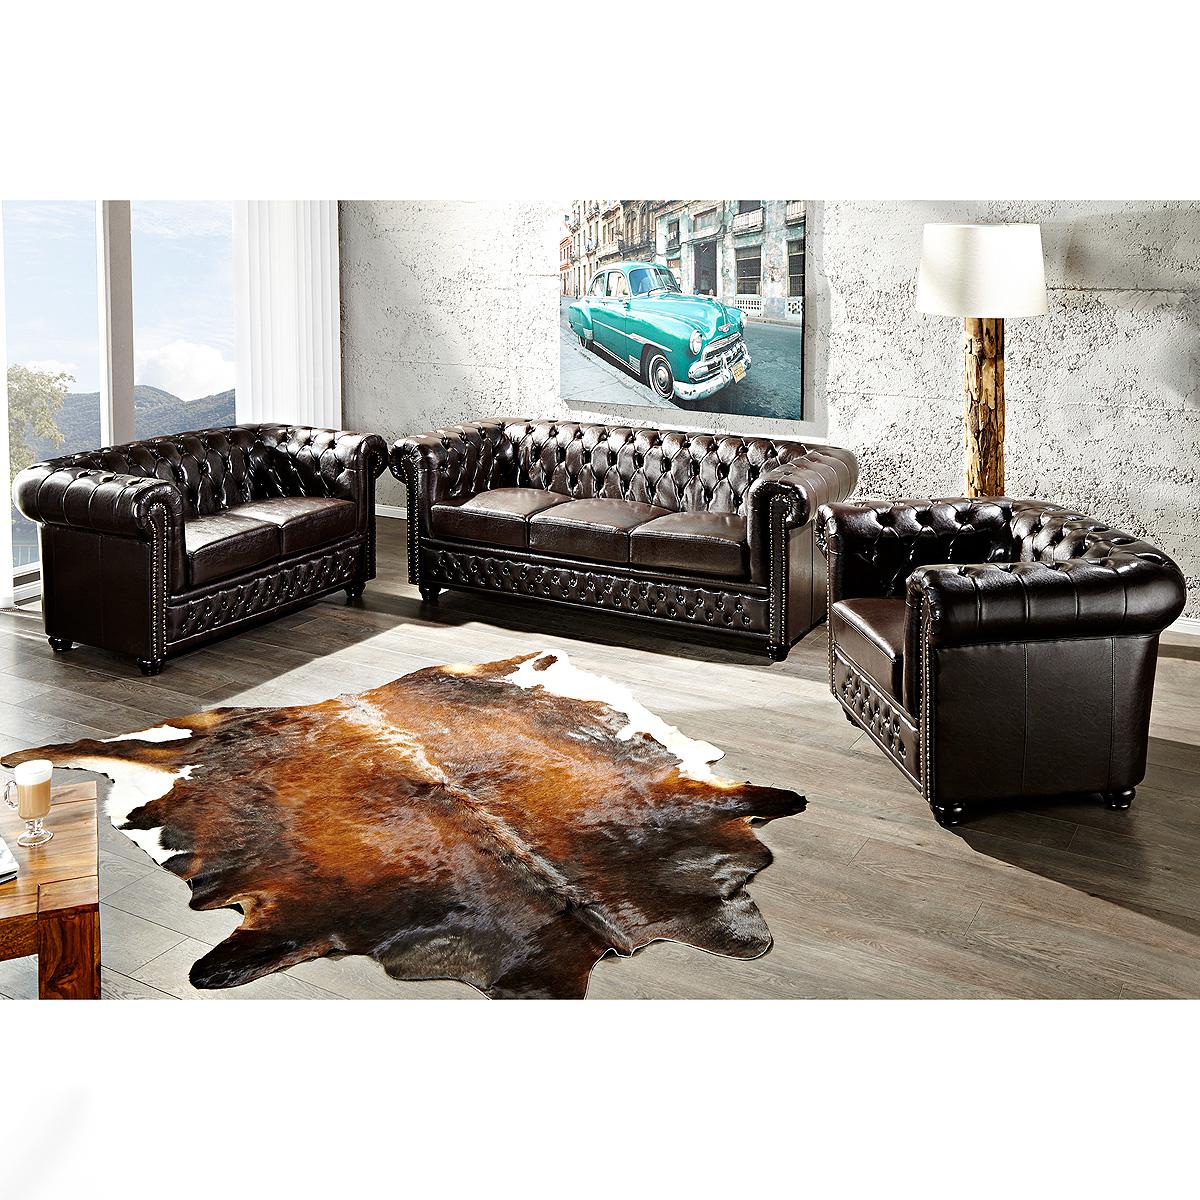 garnitur chesterfield sofa sessel lederlook dark coffee dunkel braun ebay. Black Bedroom Furniture Sets. Home Design Ideas